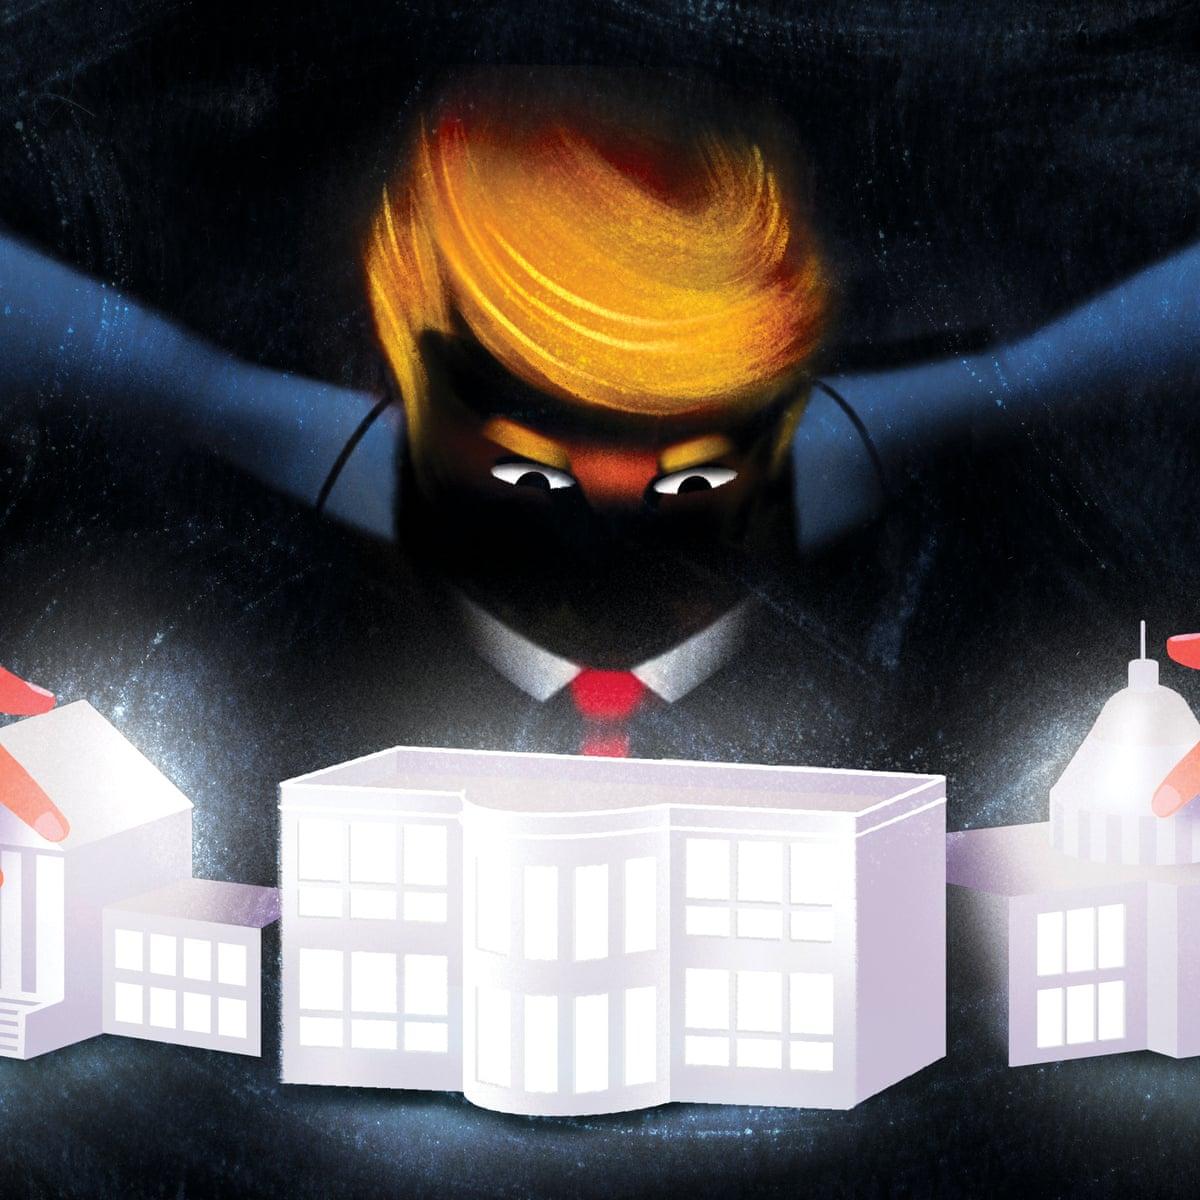 Donald Trump's plot against democracy could break America apart | Jonathan  Freedland | Opinion | The Guardian